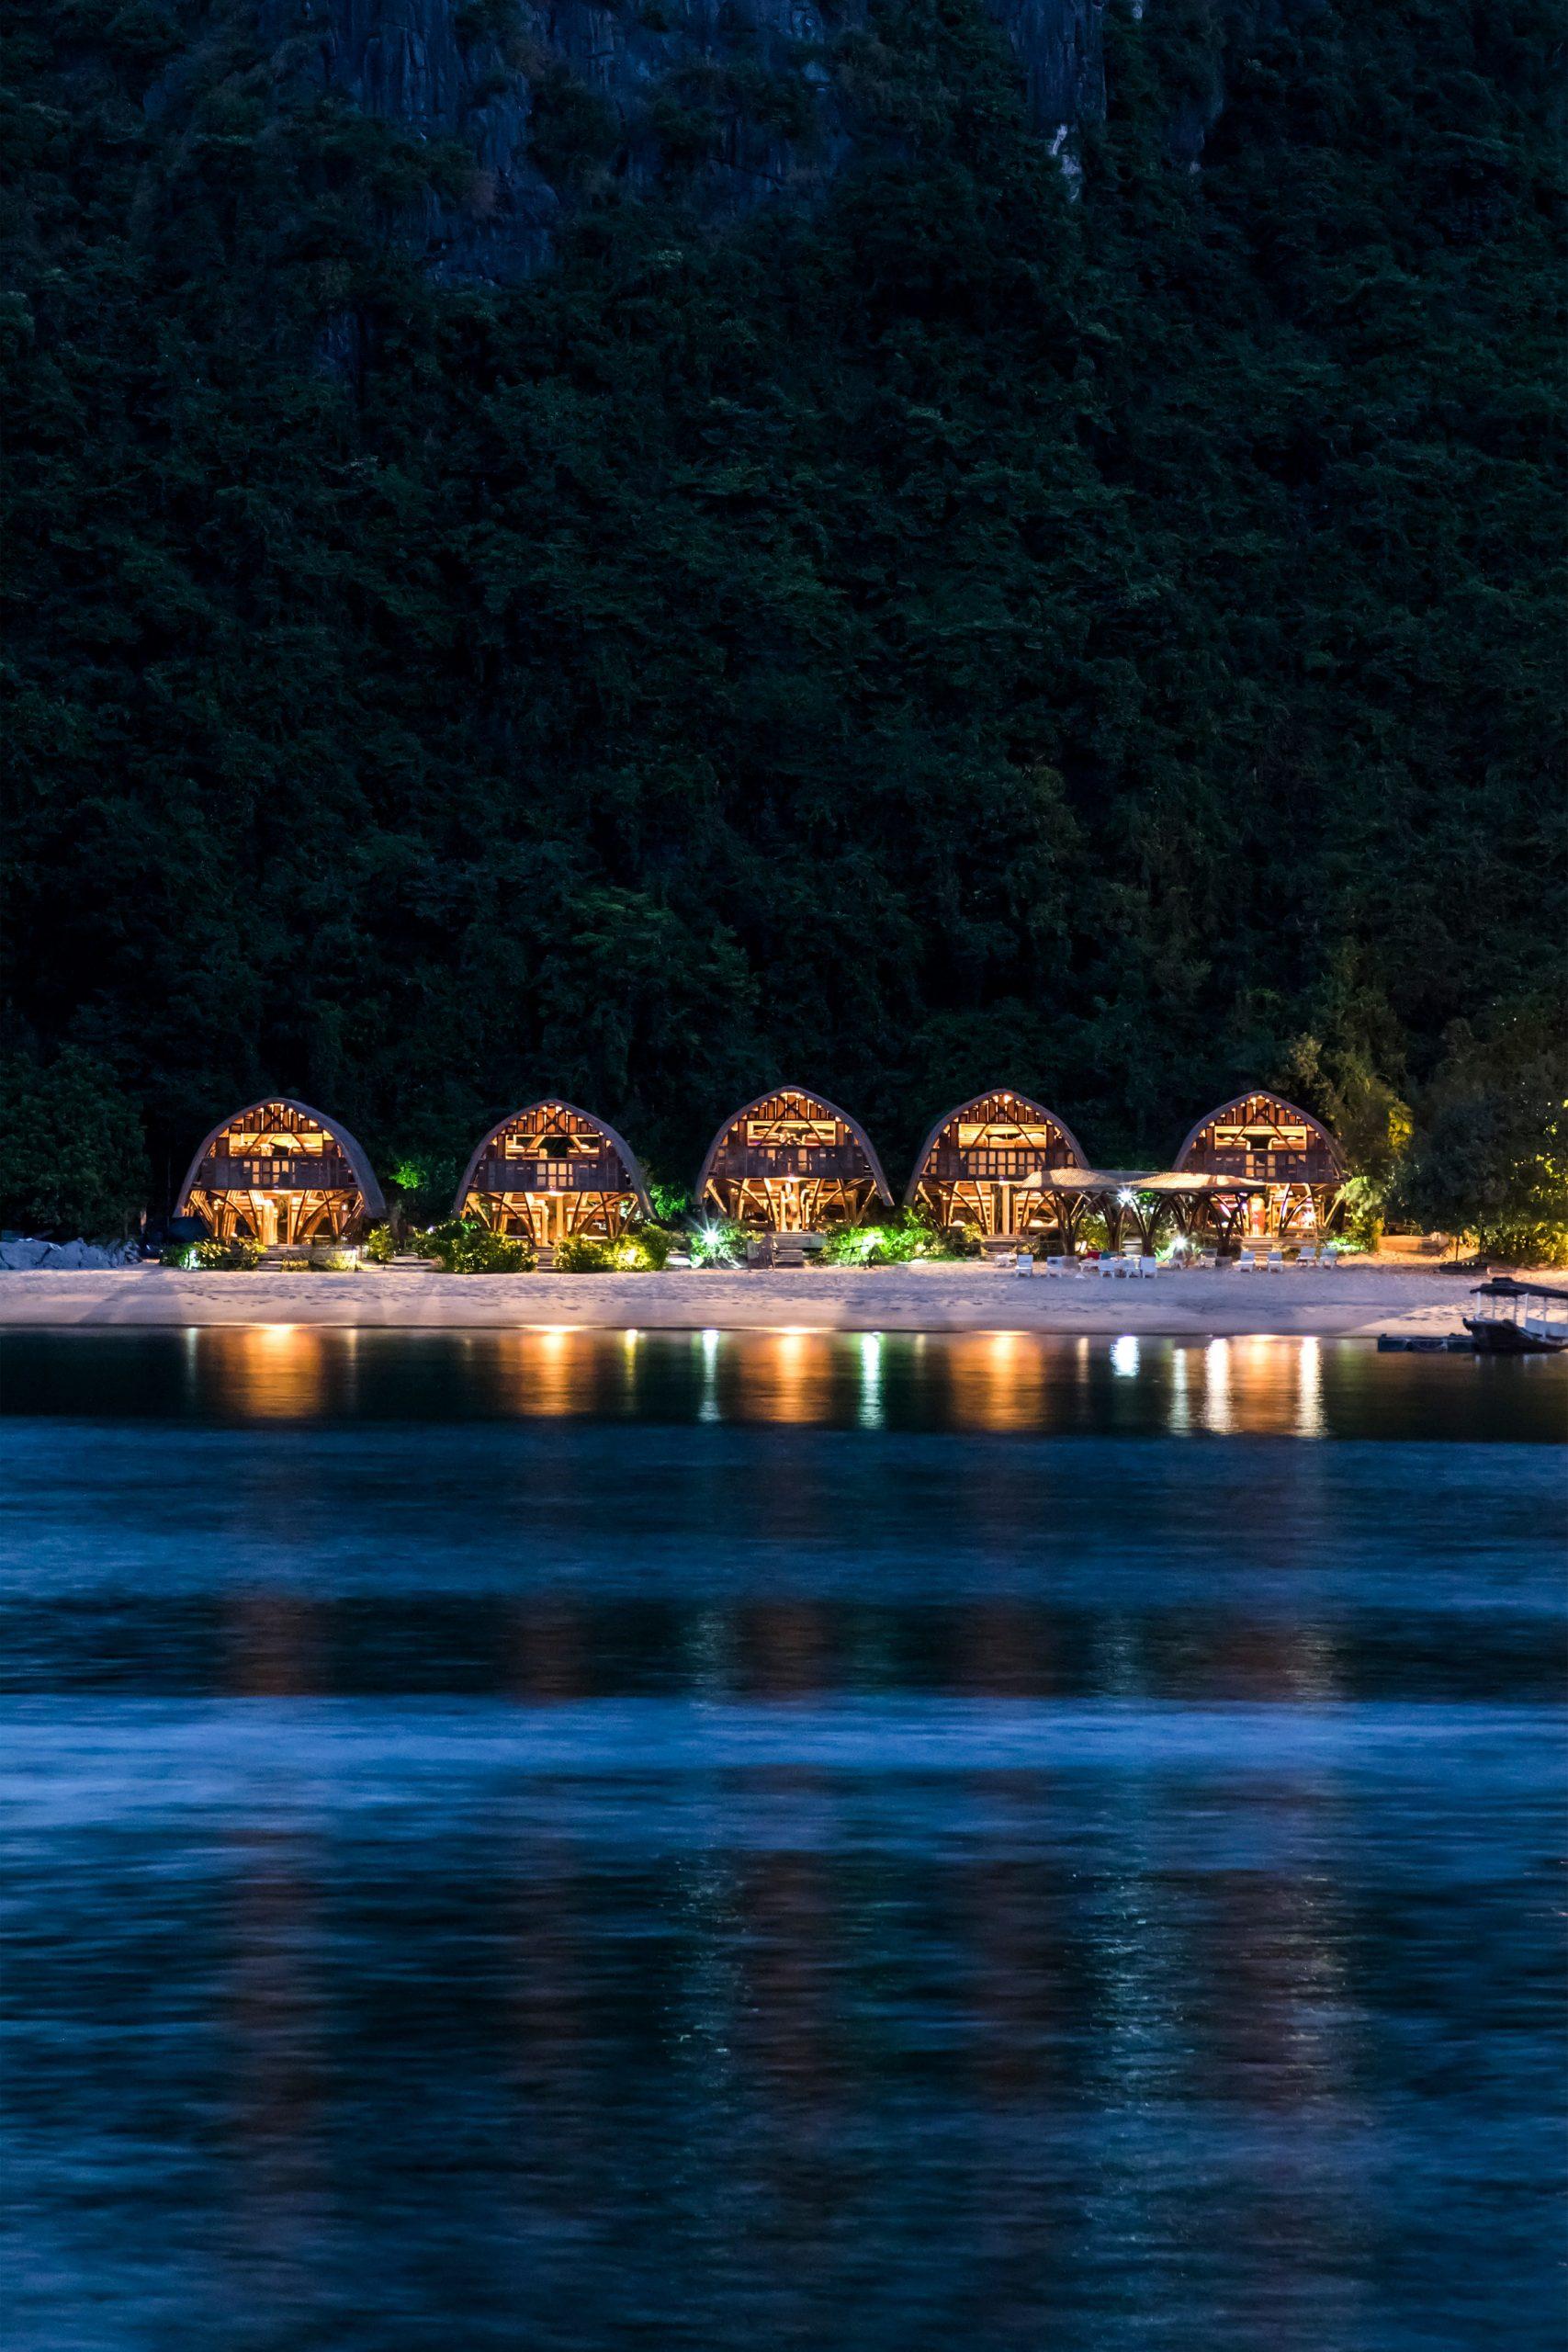 Thiết kế Resort biển 23